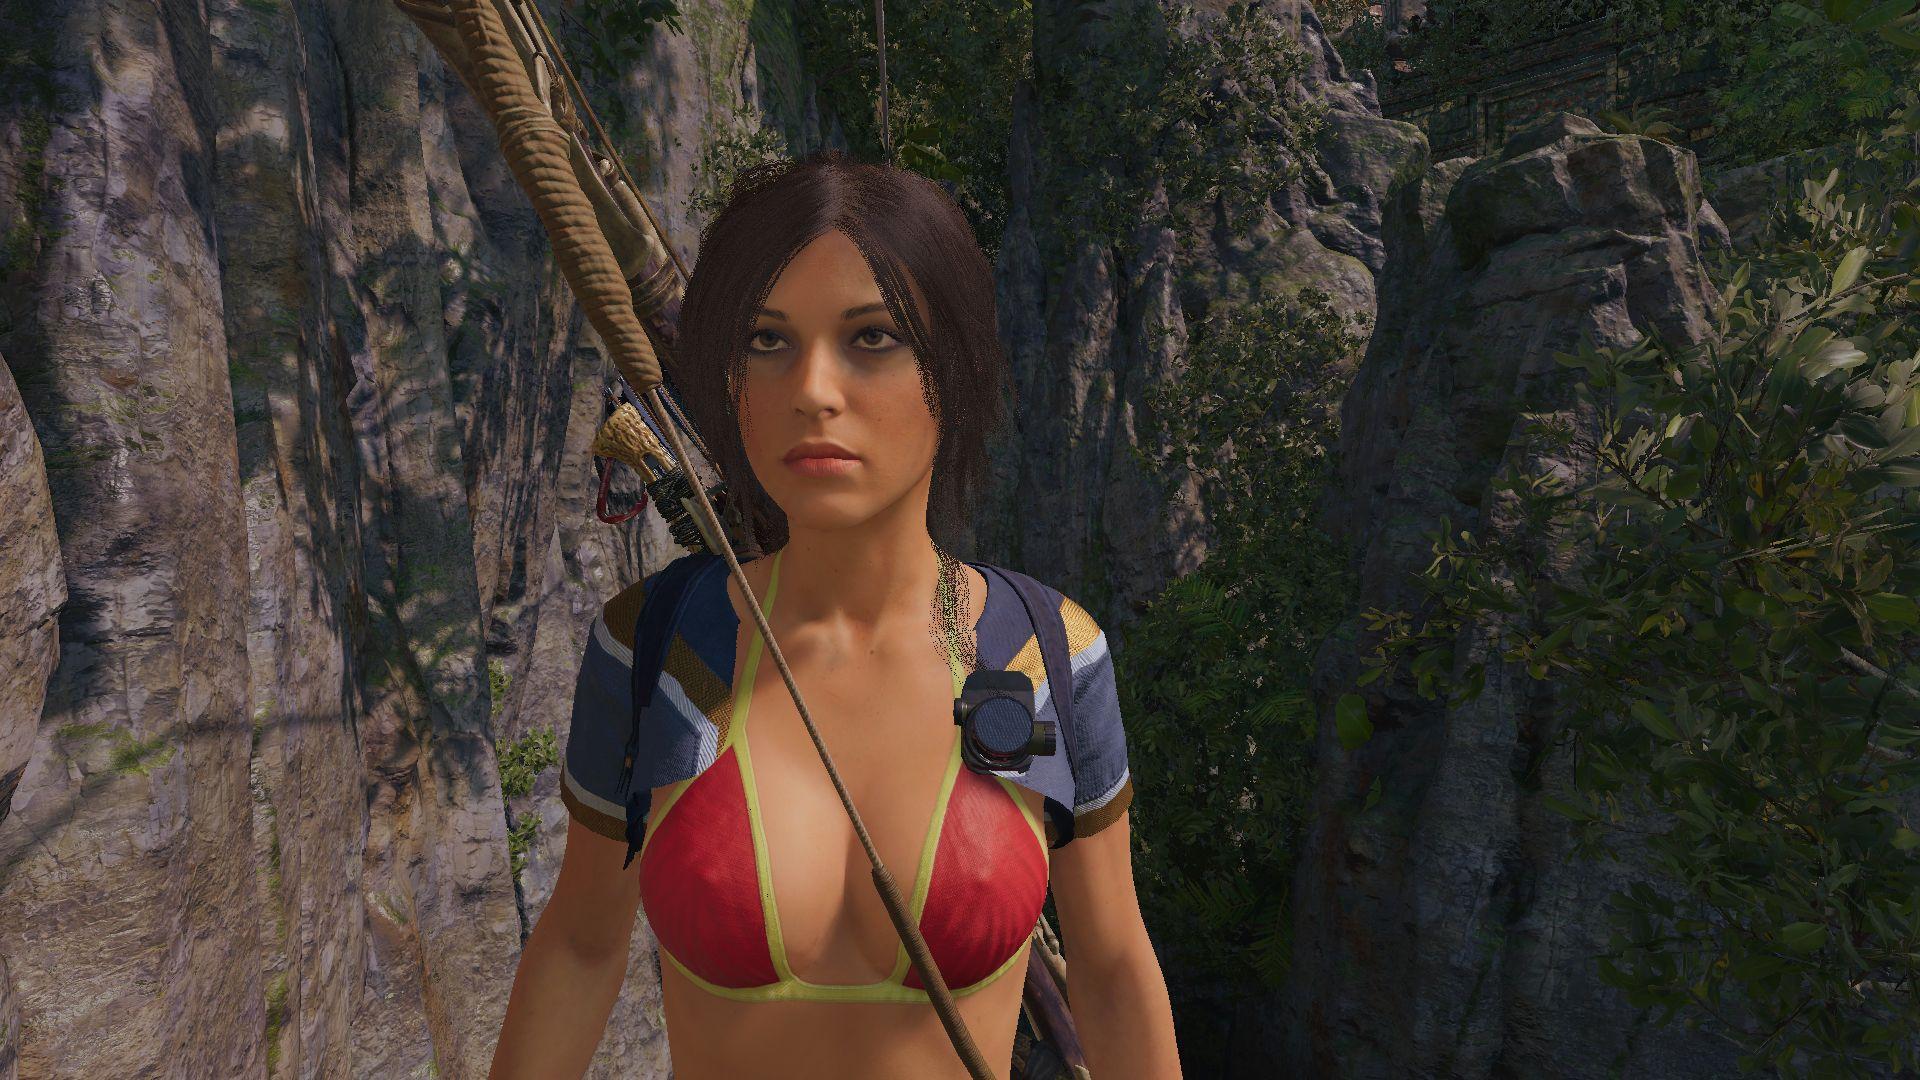 000709.Jpg - Shadow of the Tomb Raider